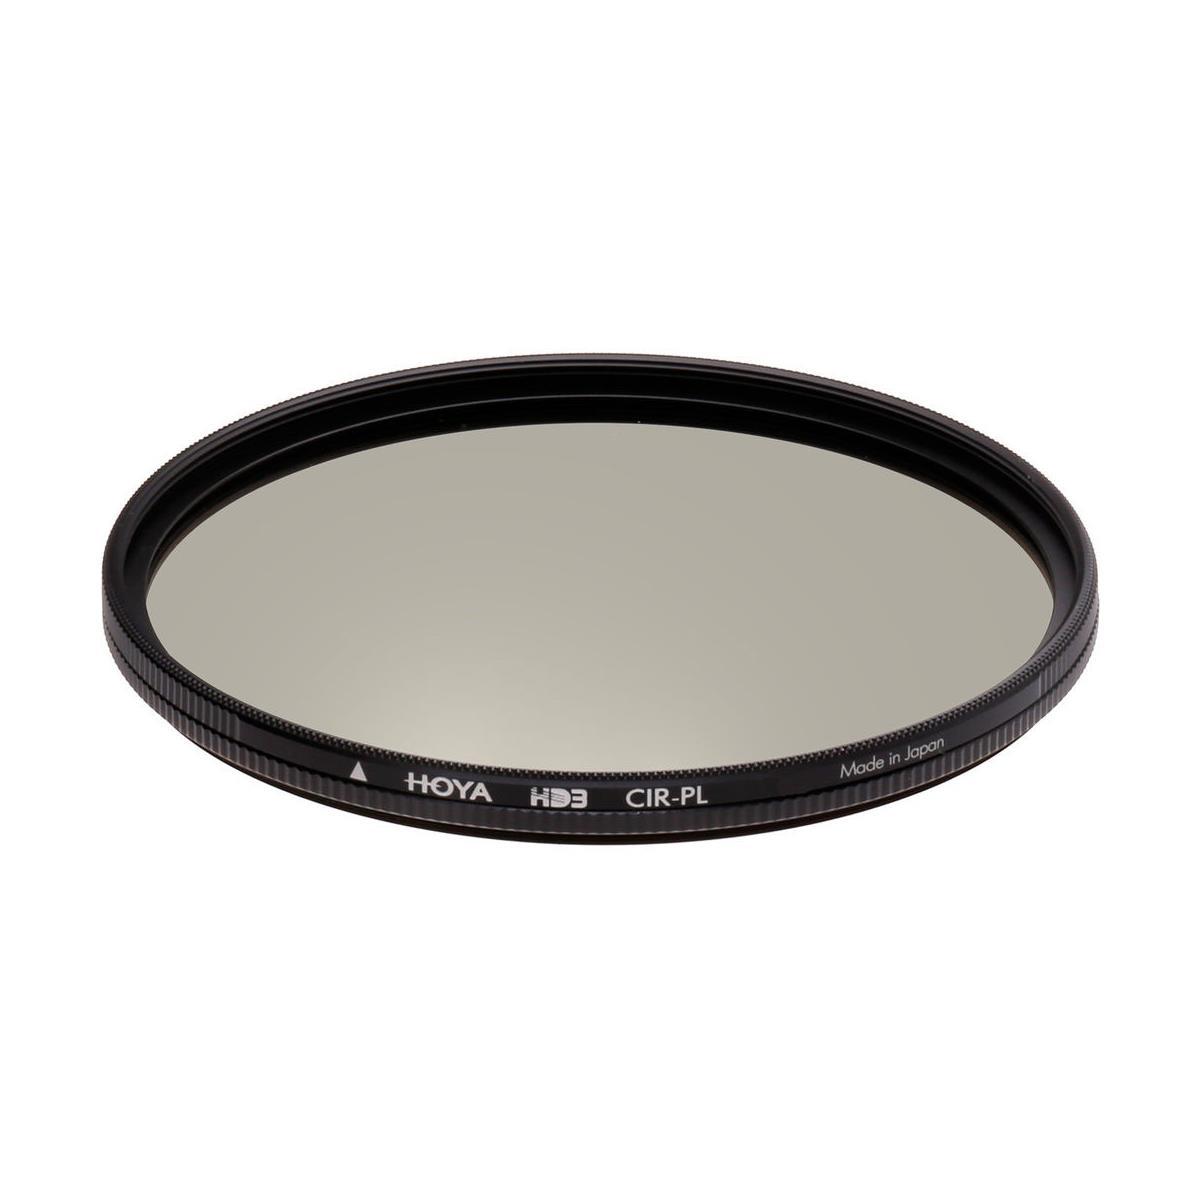 Hoya 62mm HD3 Circular Polarizer Filter